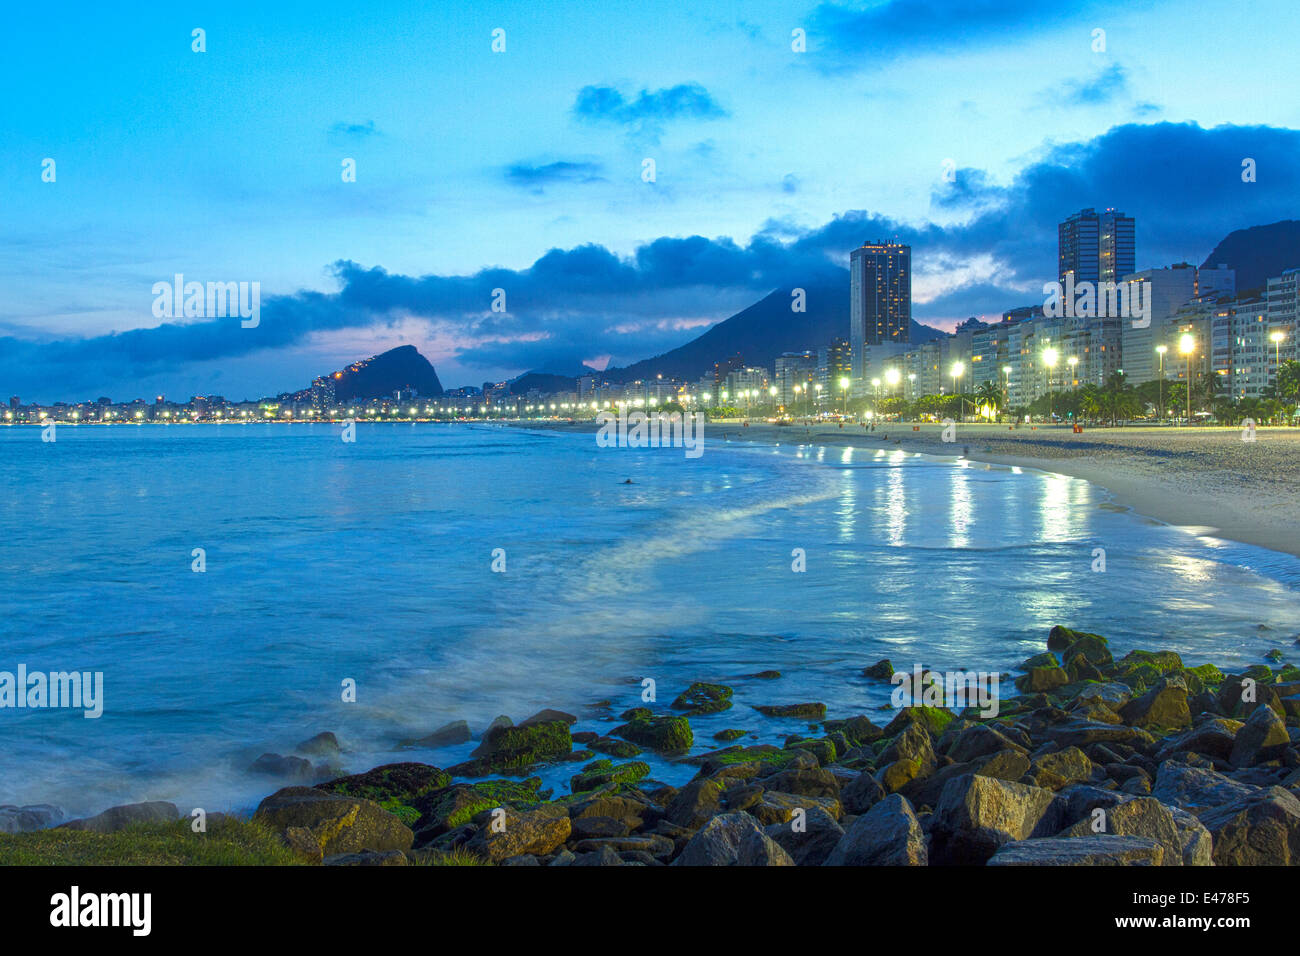 Rio de Janeiro, Brazil. Sunset at Leme beach. In the background, Copacabana. - Stock Image